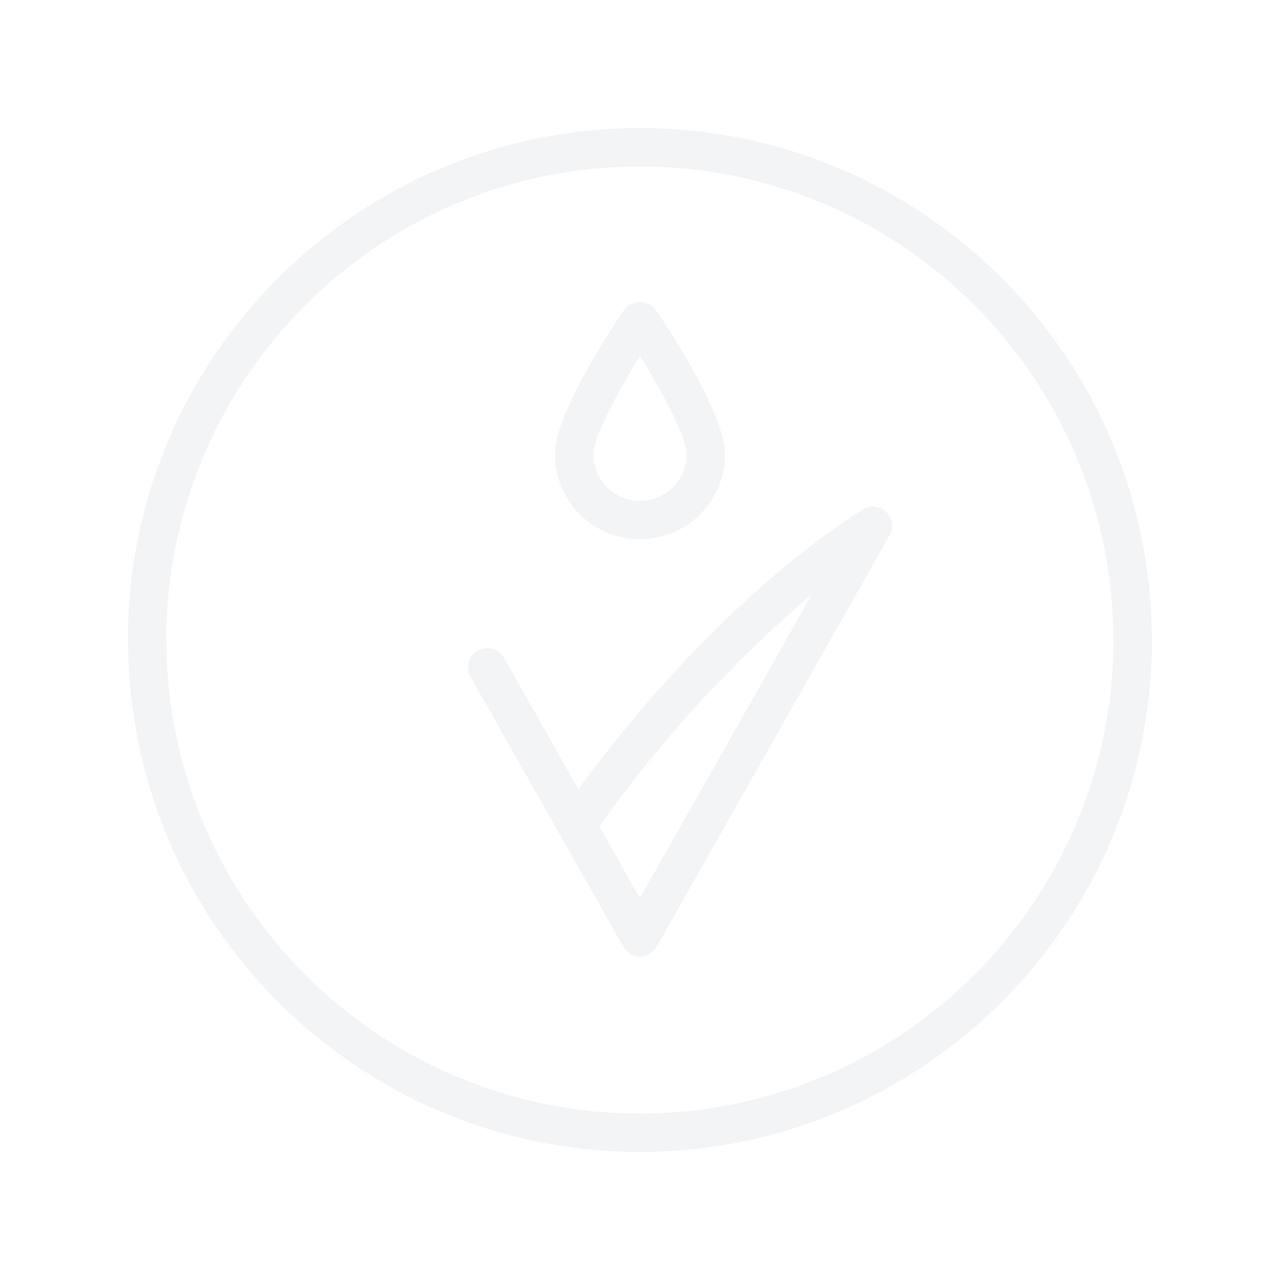 SESDERMA Atpses Facial Cell Energizer Cream 50ml